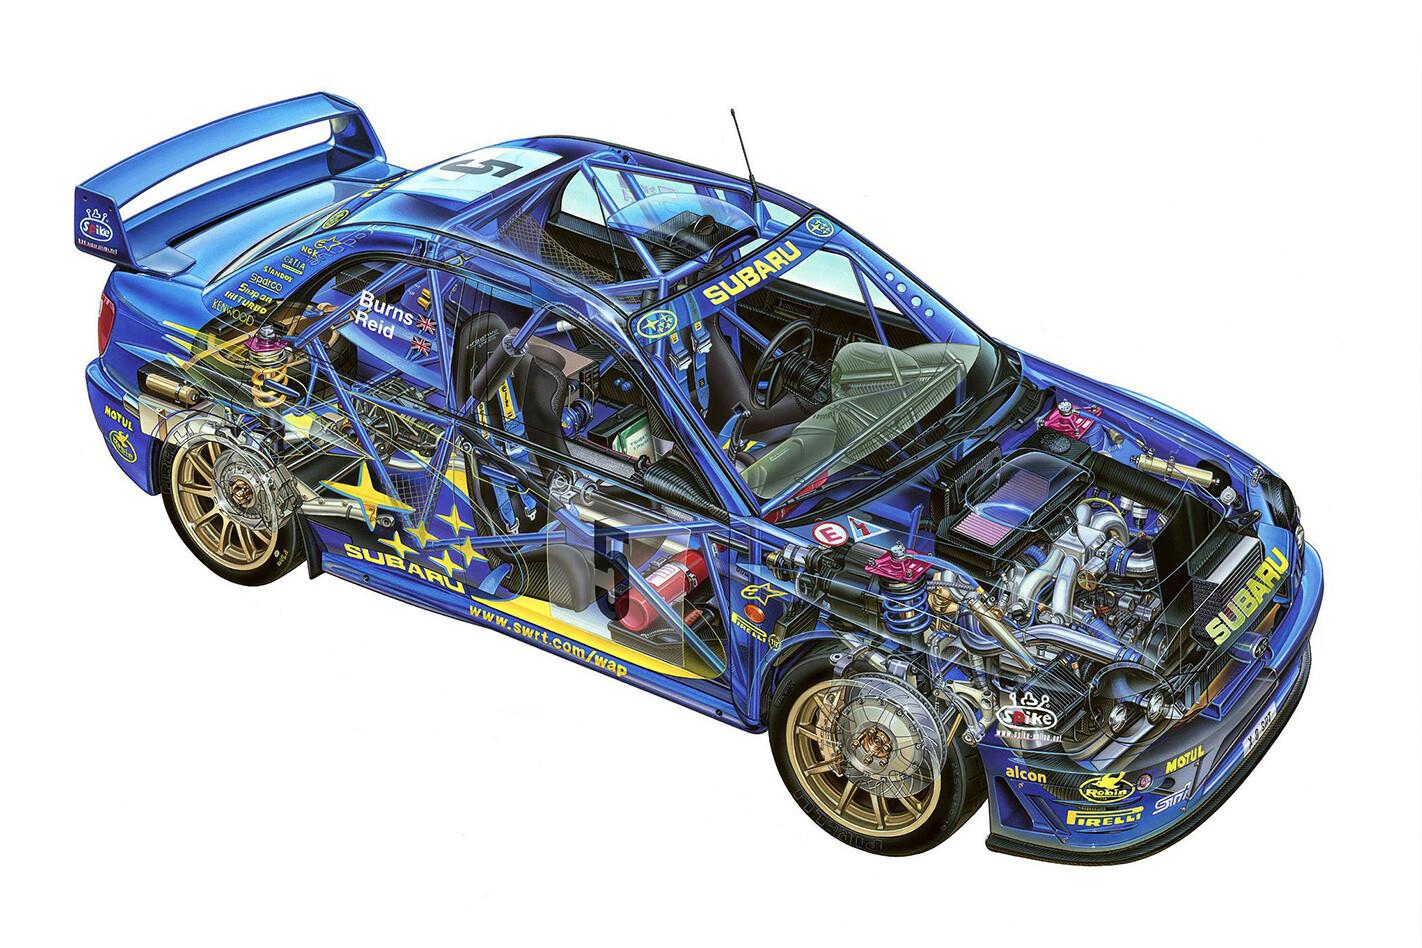 Subaru Impreza Wrx Sti Cutaway Jpg